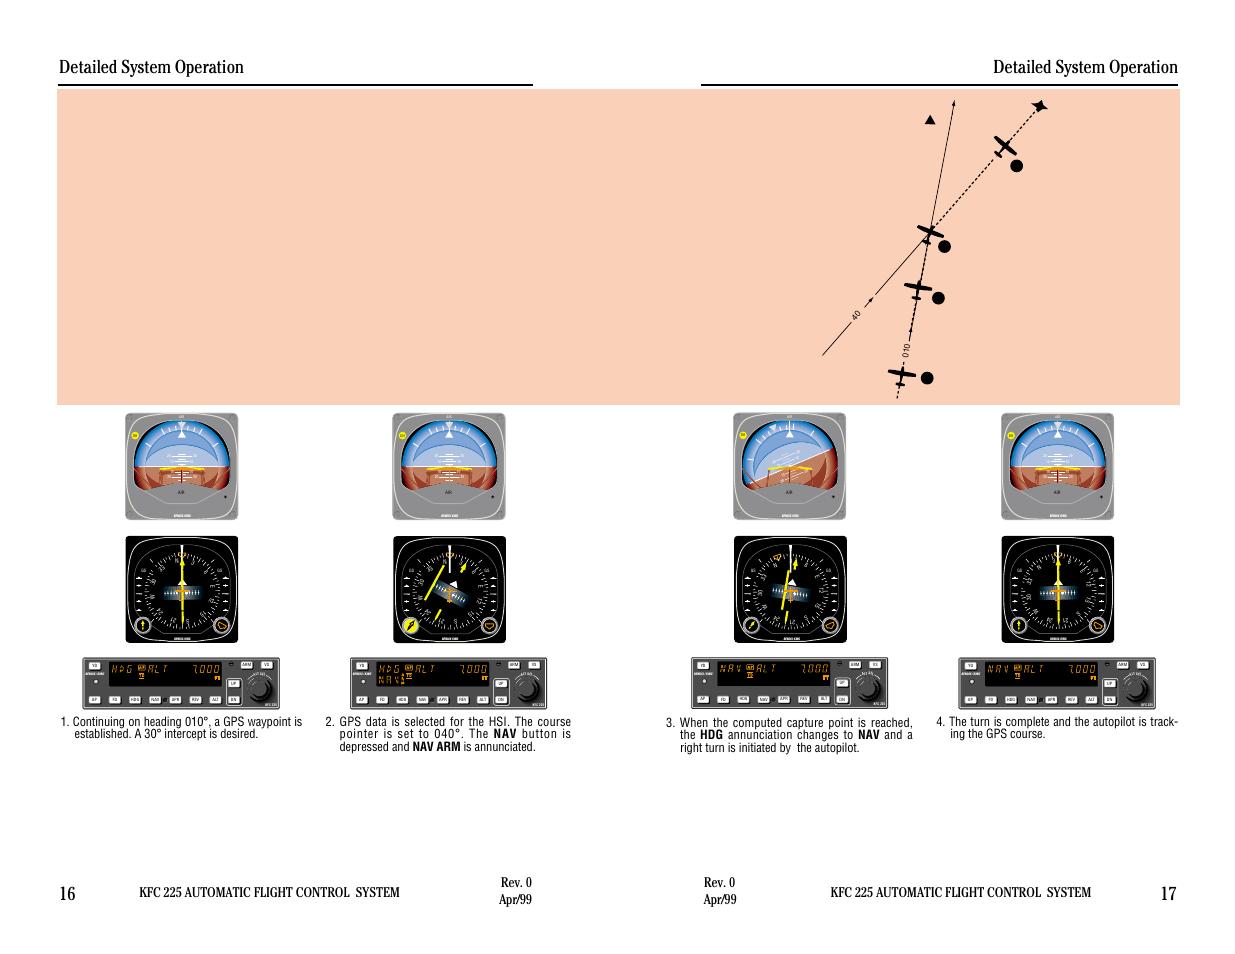 Bendix King Manual Kt76a Wiring Diagram Gps Capture Detailed System Operation 17 Rh Manualsdir Com Manuals Avionics